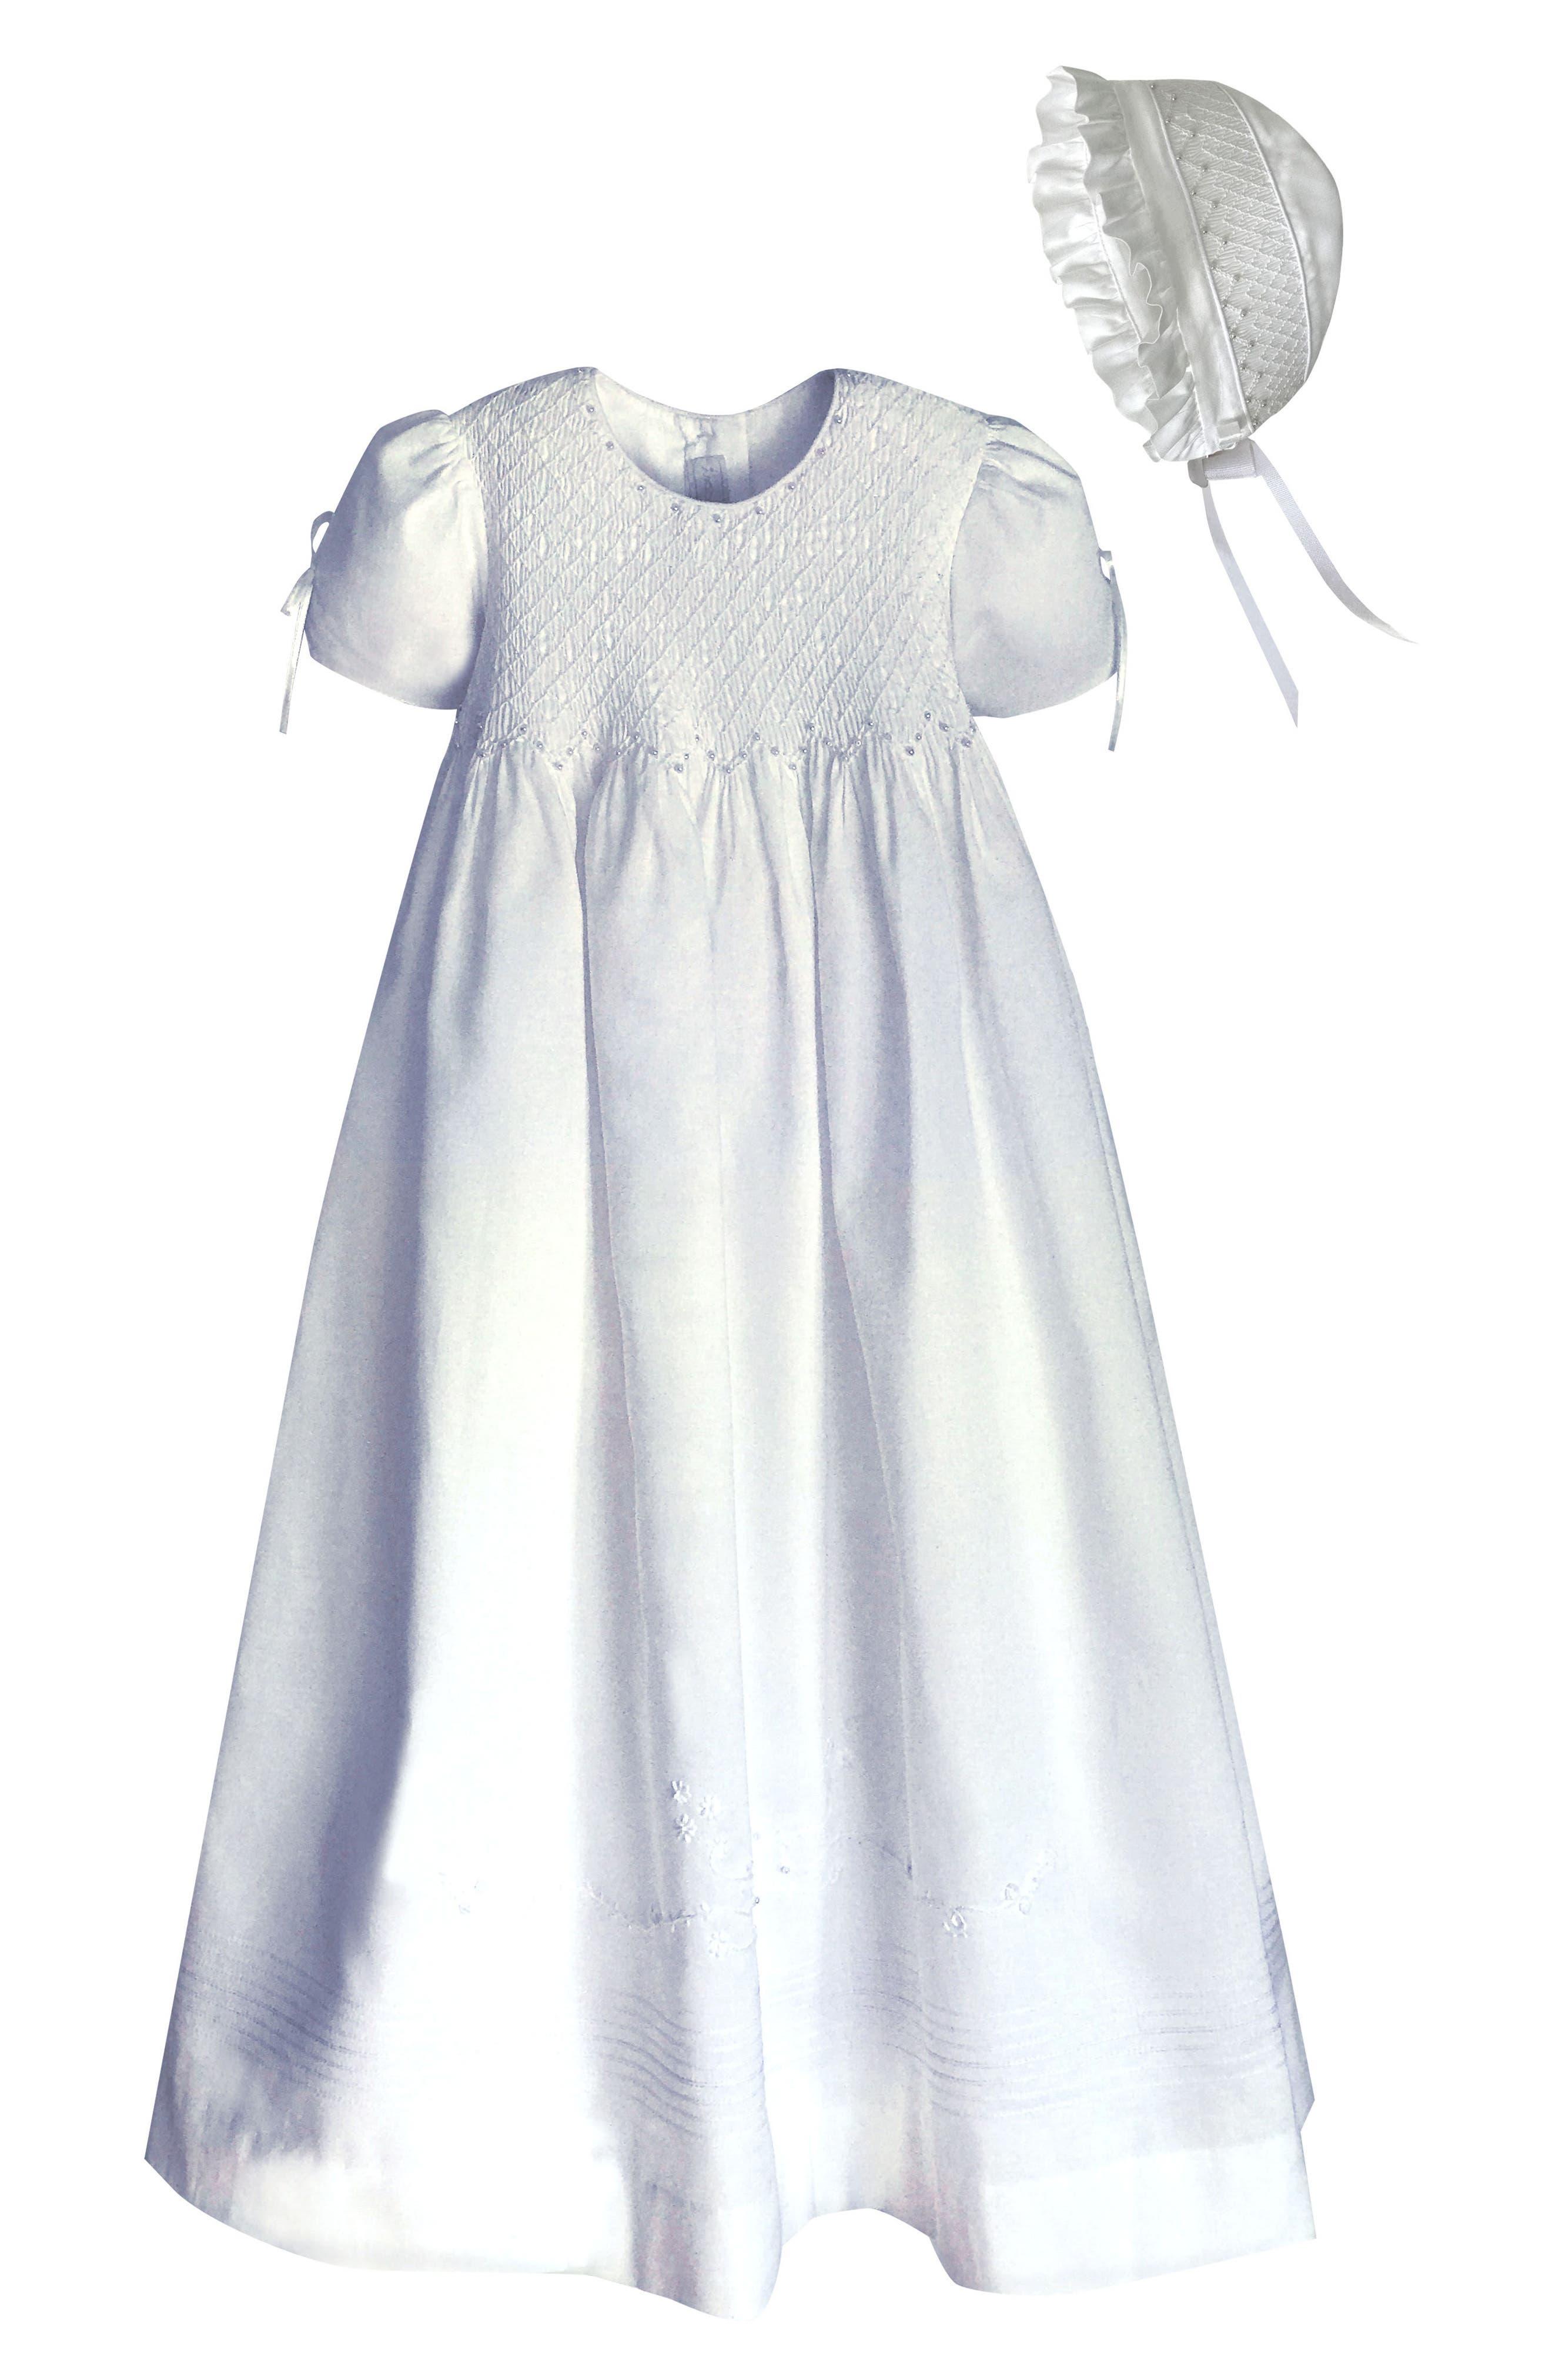 Isabel Garreton 'Pearls' Christening Gown & Bonnet (Baby)